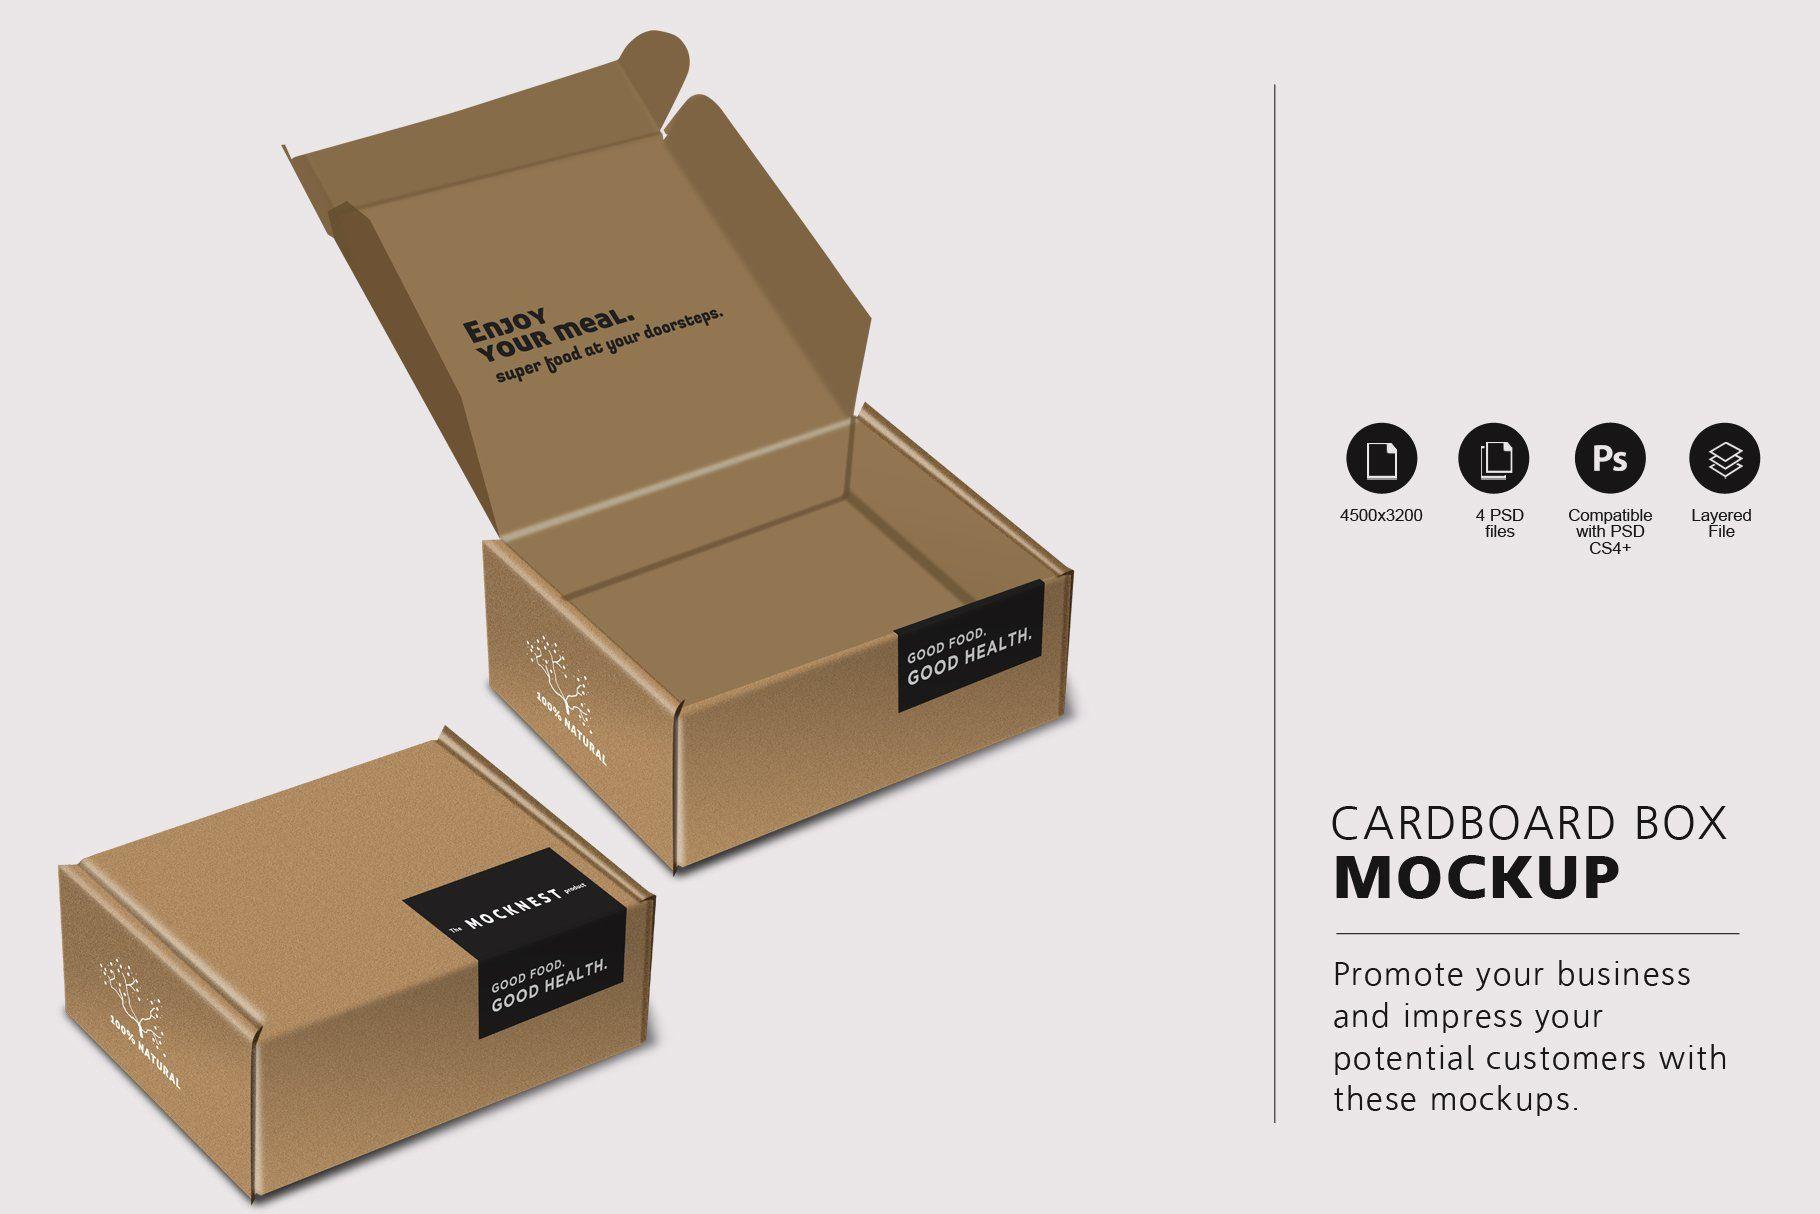 Download Cardboard Box Mockup Box Packaging Templates Box Mockup Packaging Labels Design